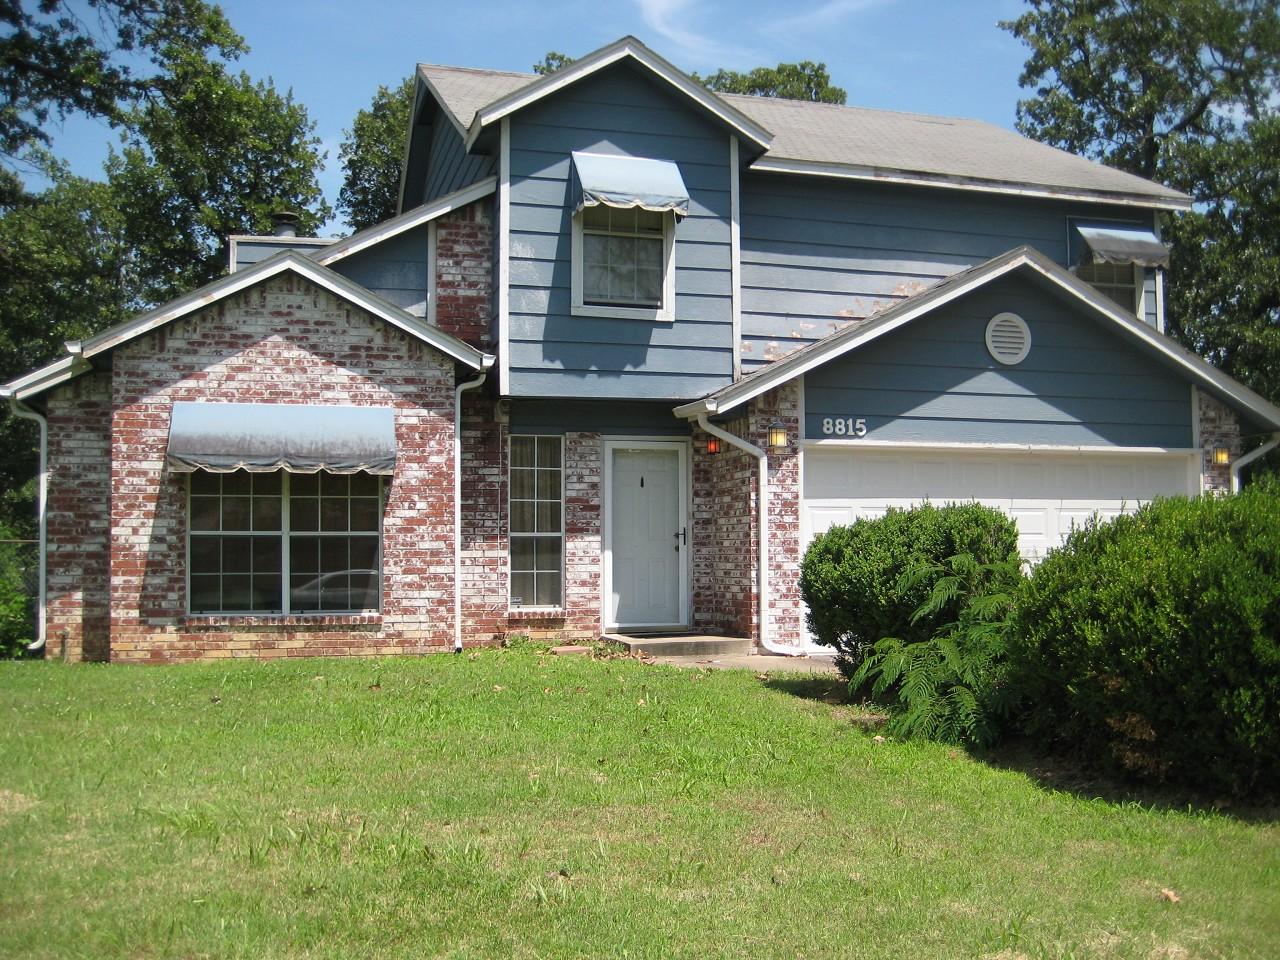 Real Estate for Sale, ListingId: 28651306, Sperry,OK74073